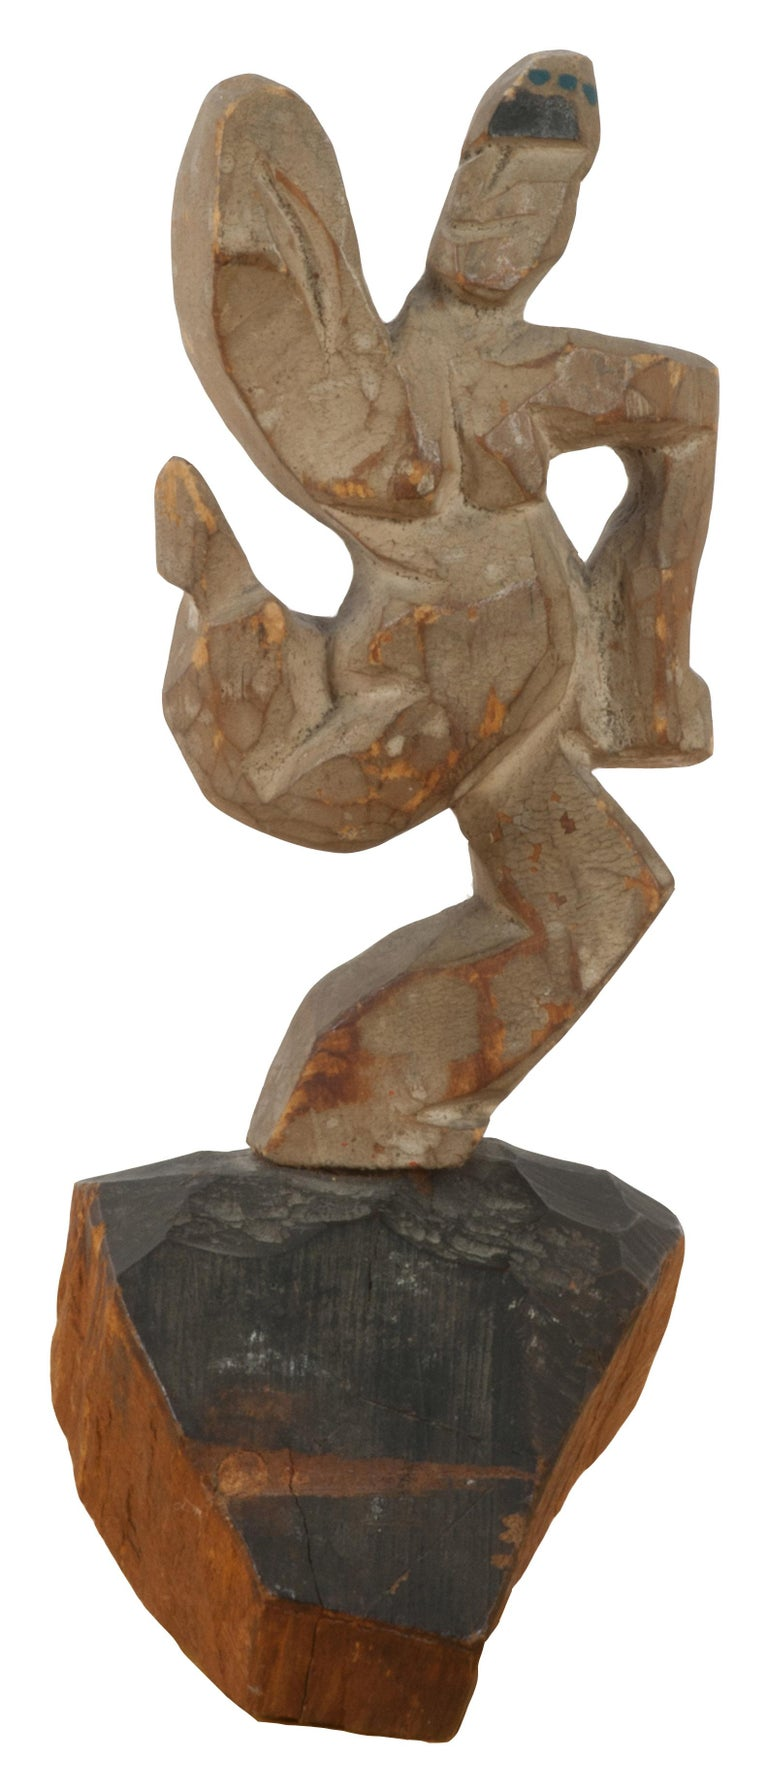 Walt Kuhn Figurative Sculpture - untitled (Dancing Figure)